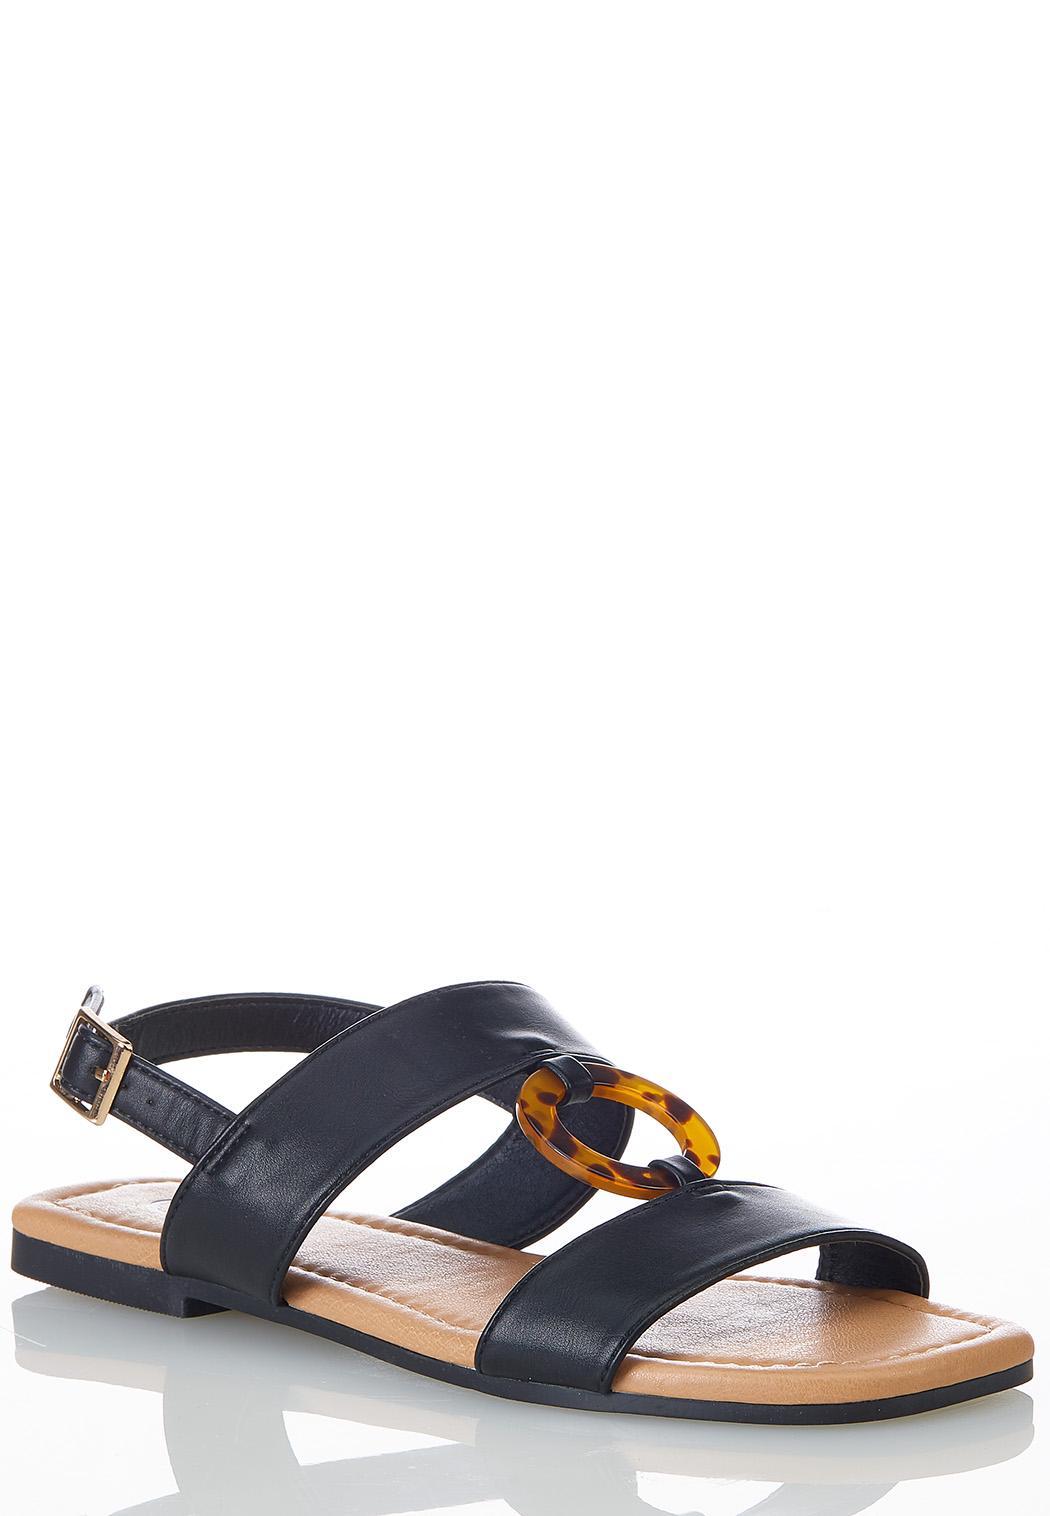 Tort Ring Slingback Sandals